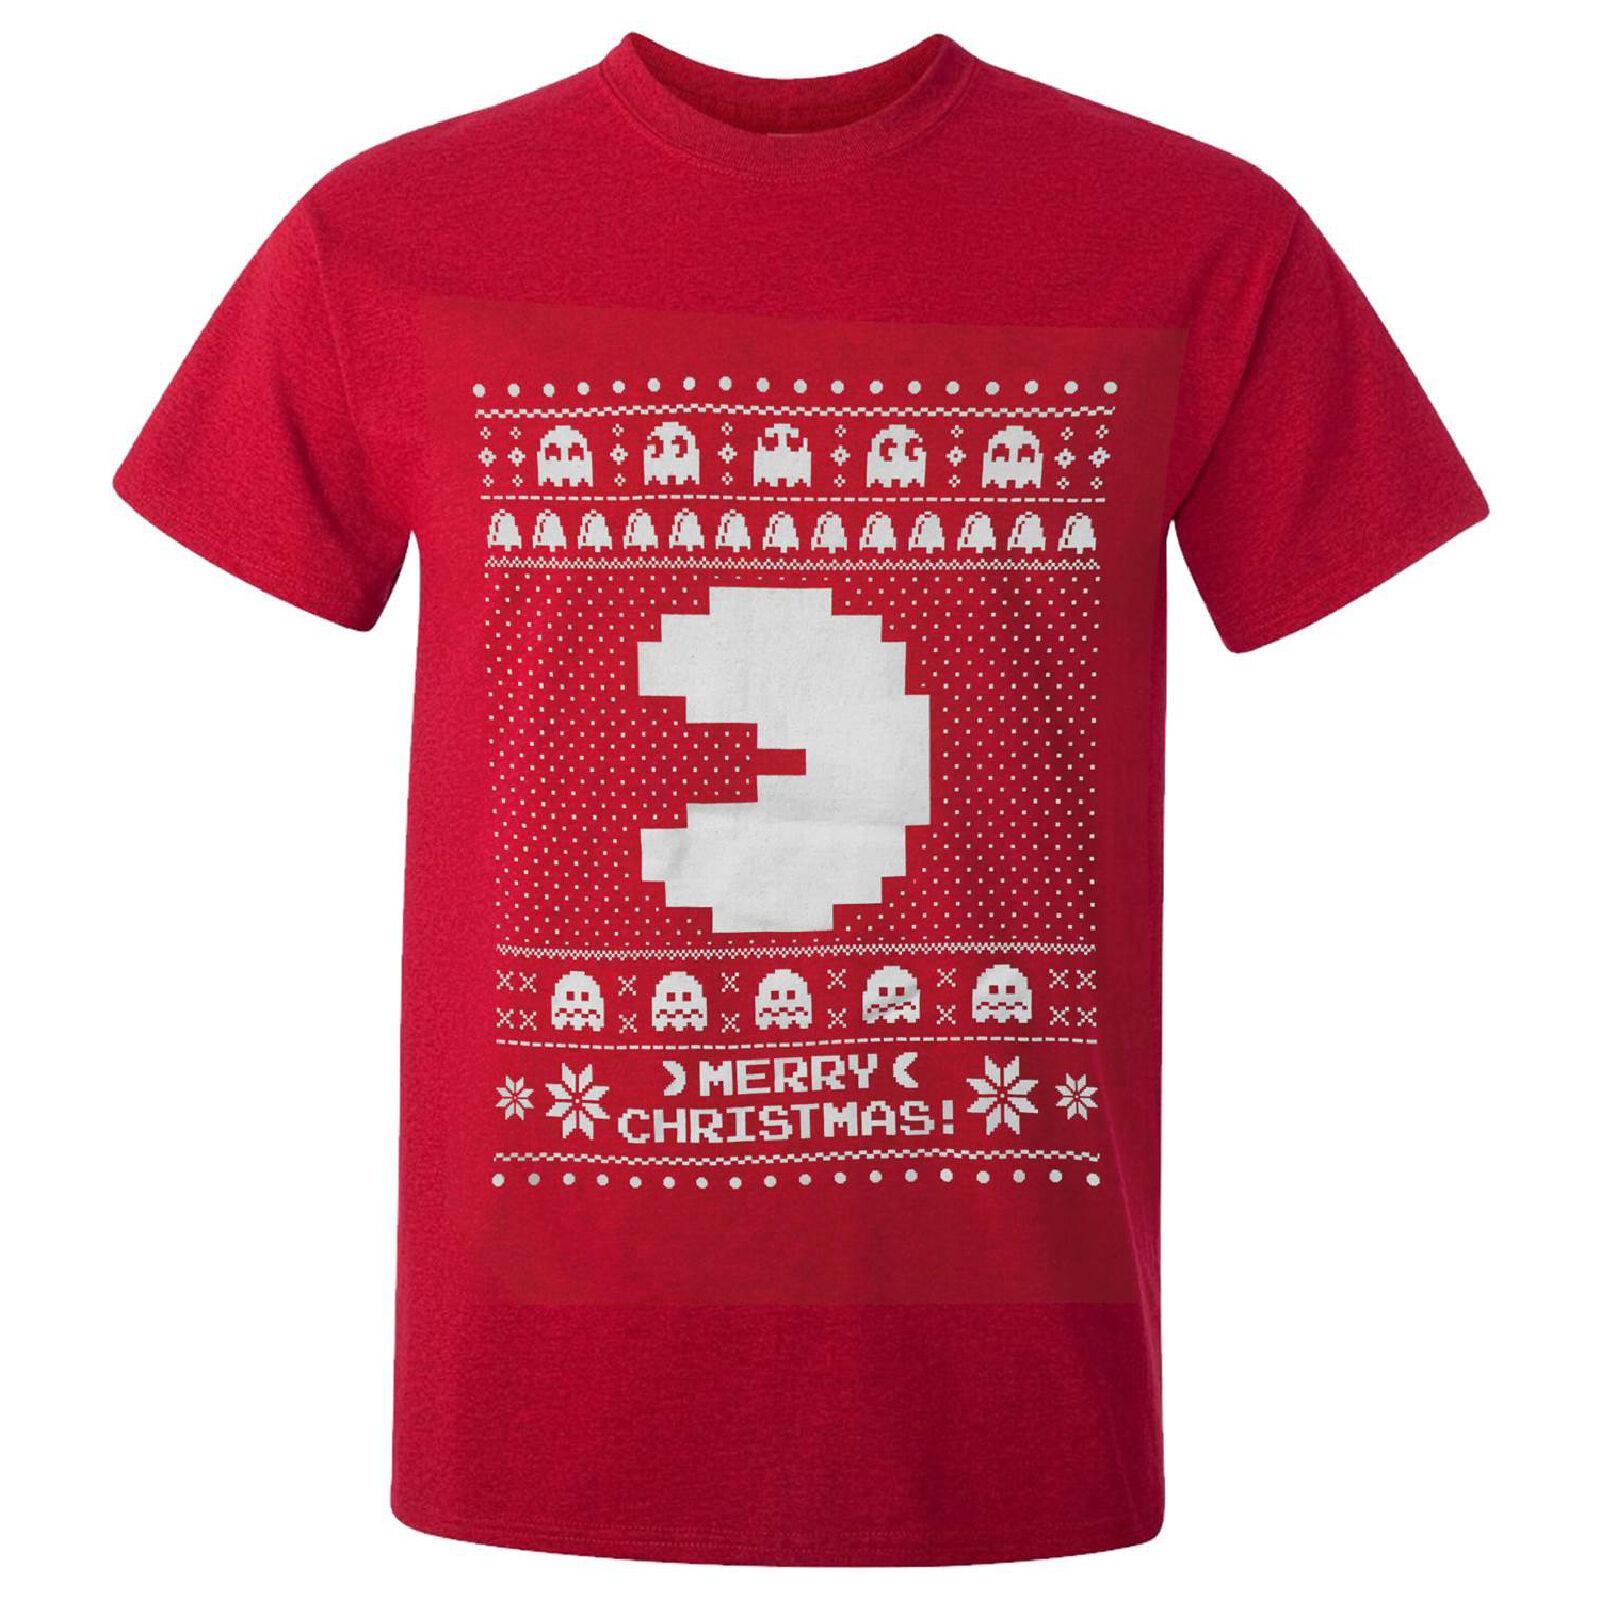 Geek Clothing Namco Men's Merry Pac-Man Christmas T-Shirt - Red - M - Red